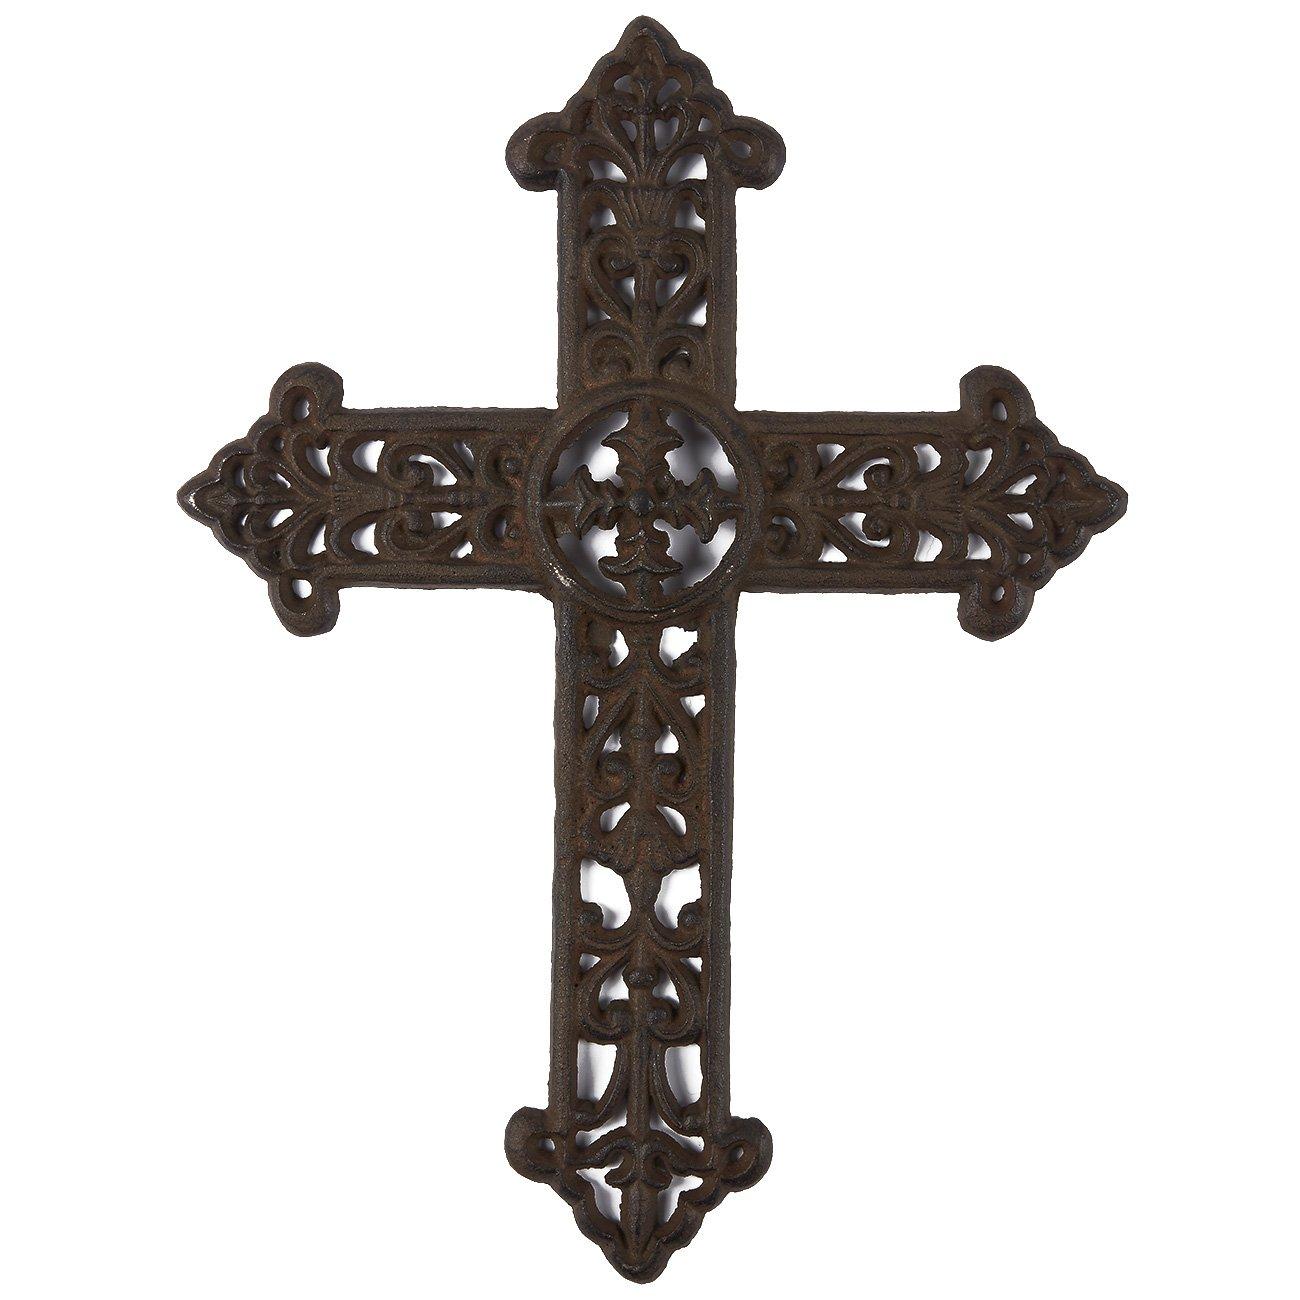 Juvale Wrought Iron Cross Decoration - Rustic Celtic Cross, Metal Cross Christian Religious Art Lovers, Dark Bronze, 15 x 11.3 x 0.5 inches